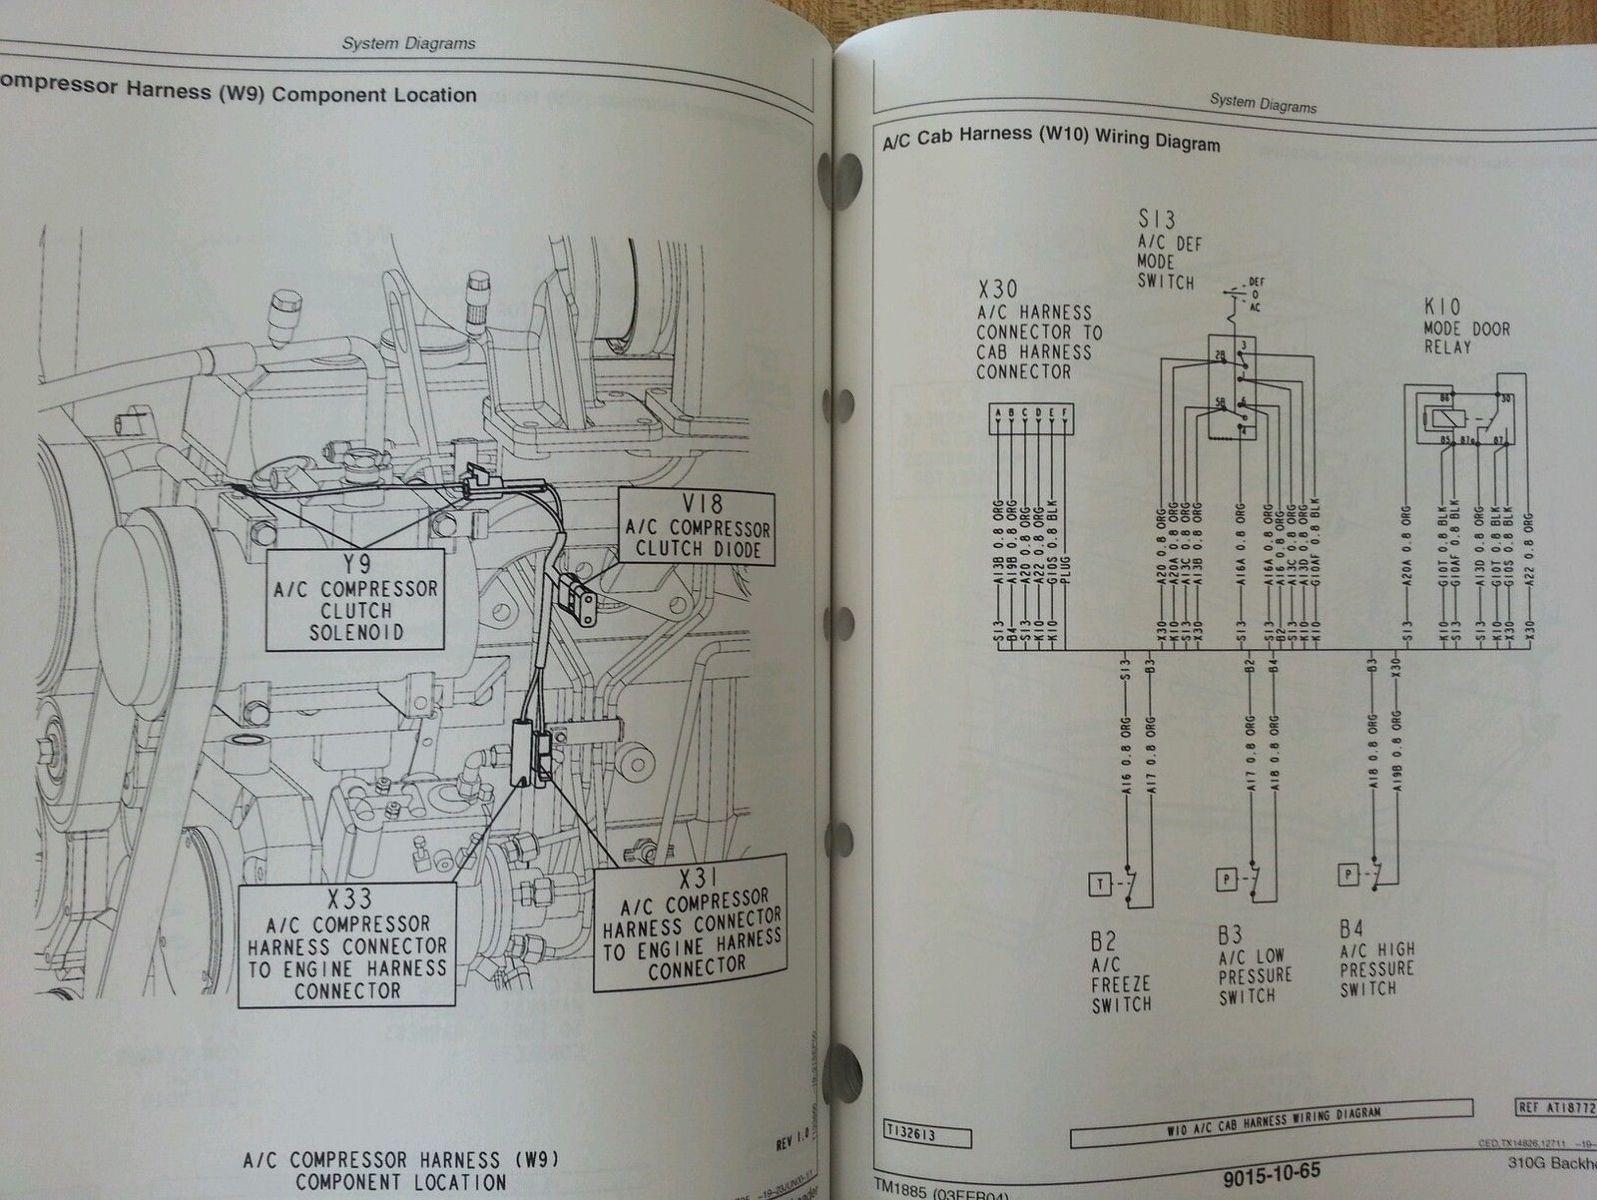 sd424282558 john deere jd 310g backhoe loader service technical operation test manual tm1885 4 case 310 hydraulic diagram